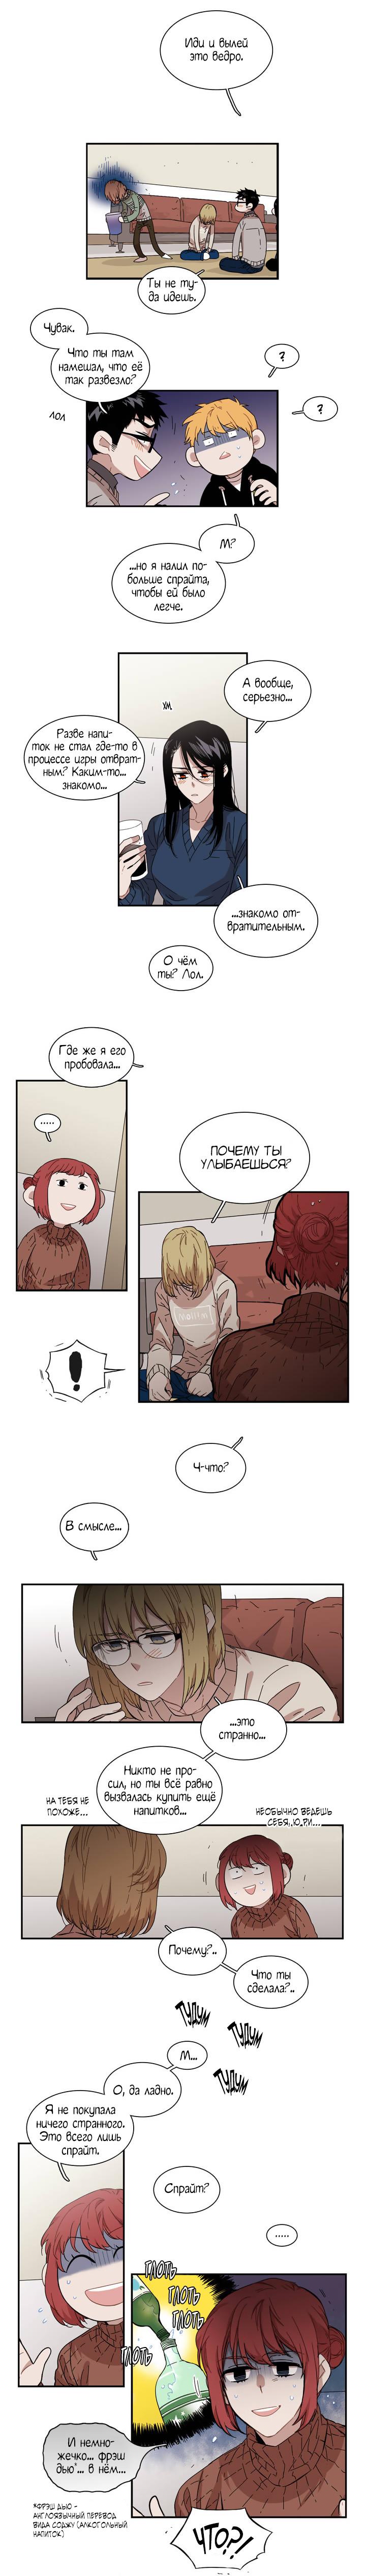 https://r2.ninemanga.com/comics/pic3/24/19800/1288633/1544642669457.jpg Page 3